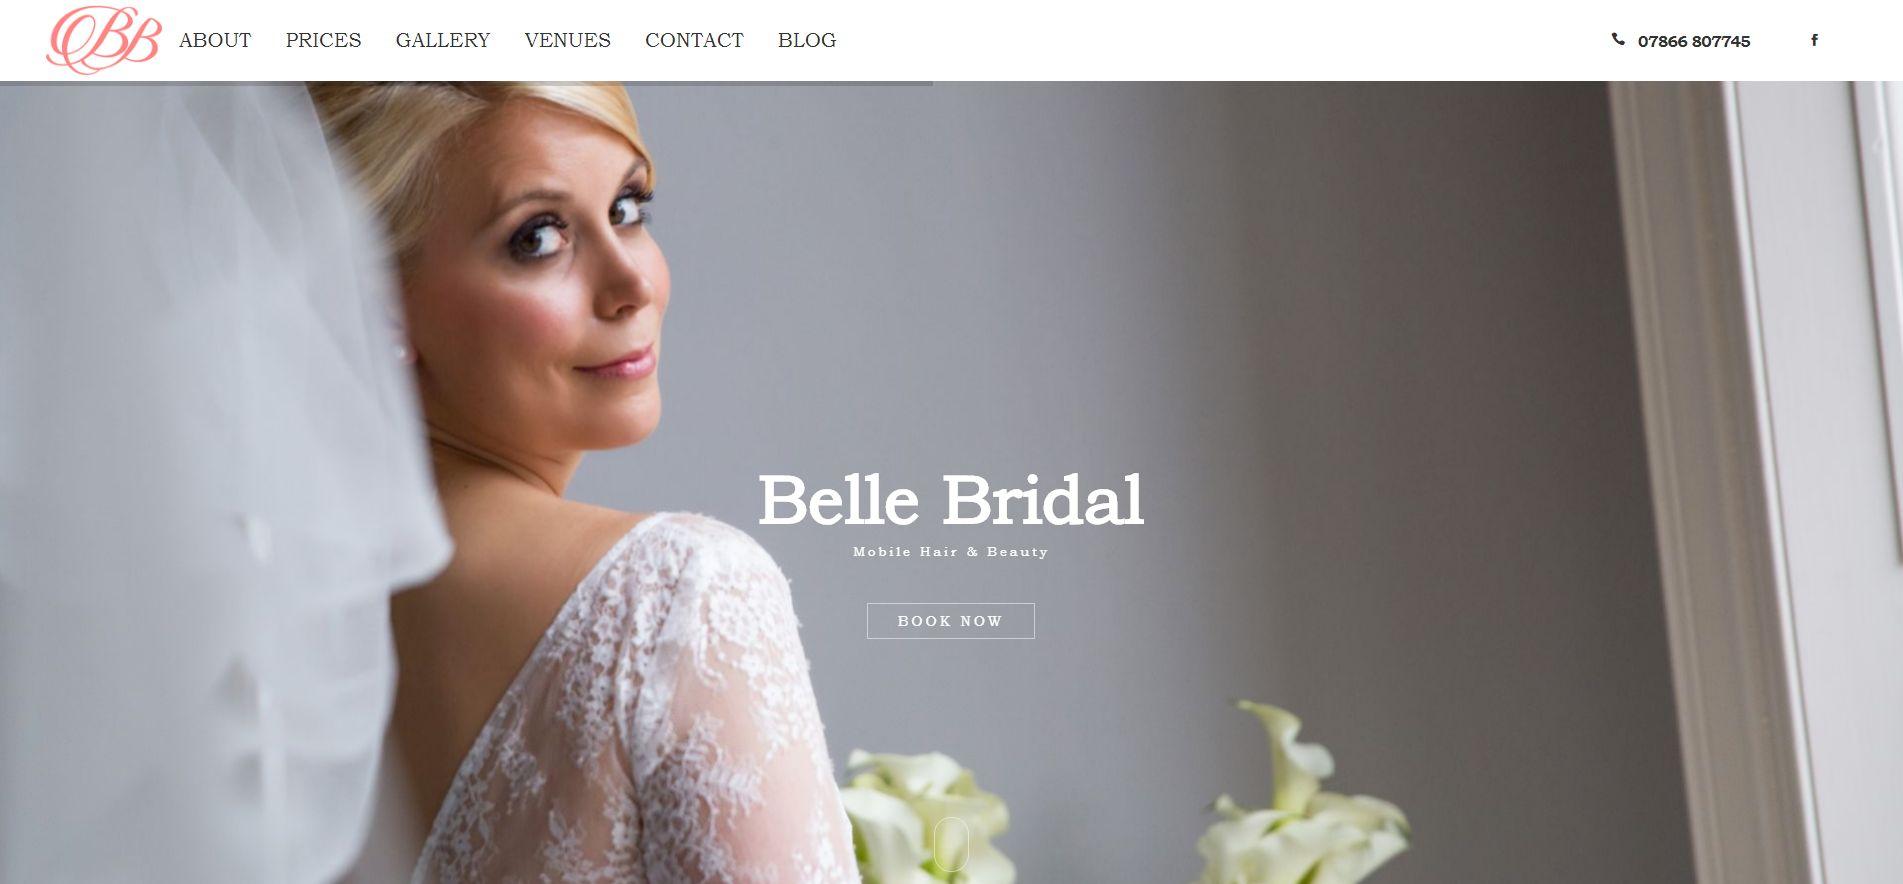 Belle-Bridal-Hair-Beauty-1-1